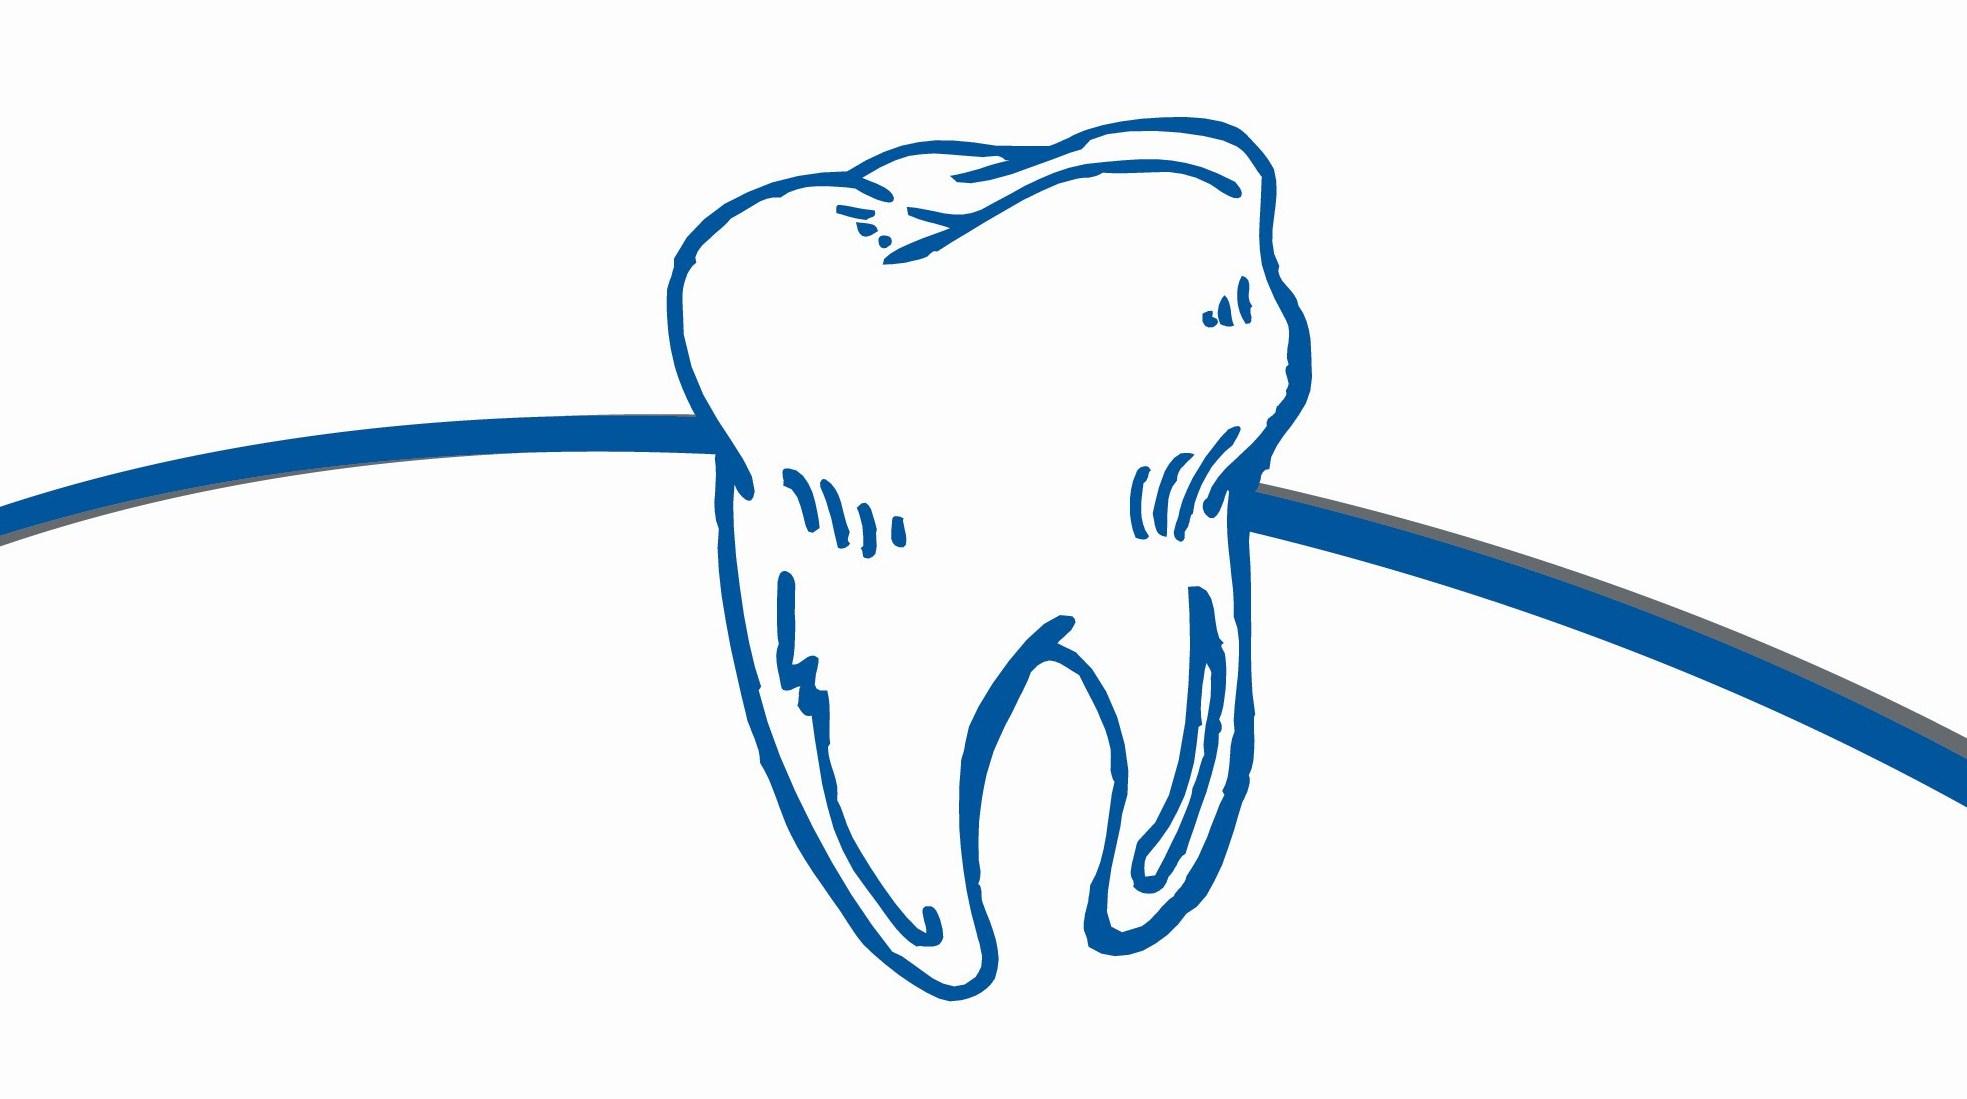 Highlands clip art library. Dentist clipart dental lab